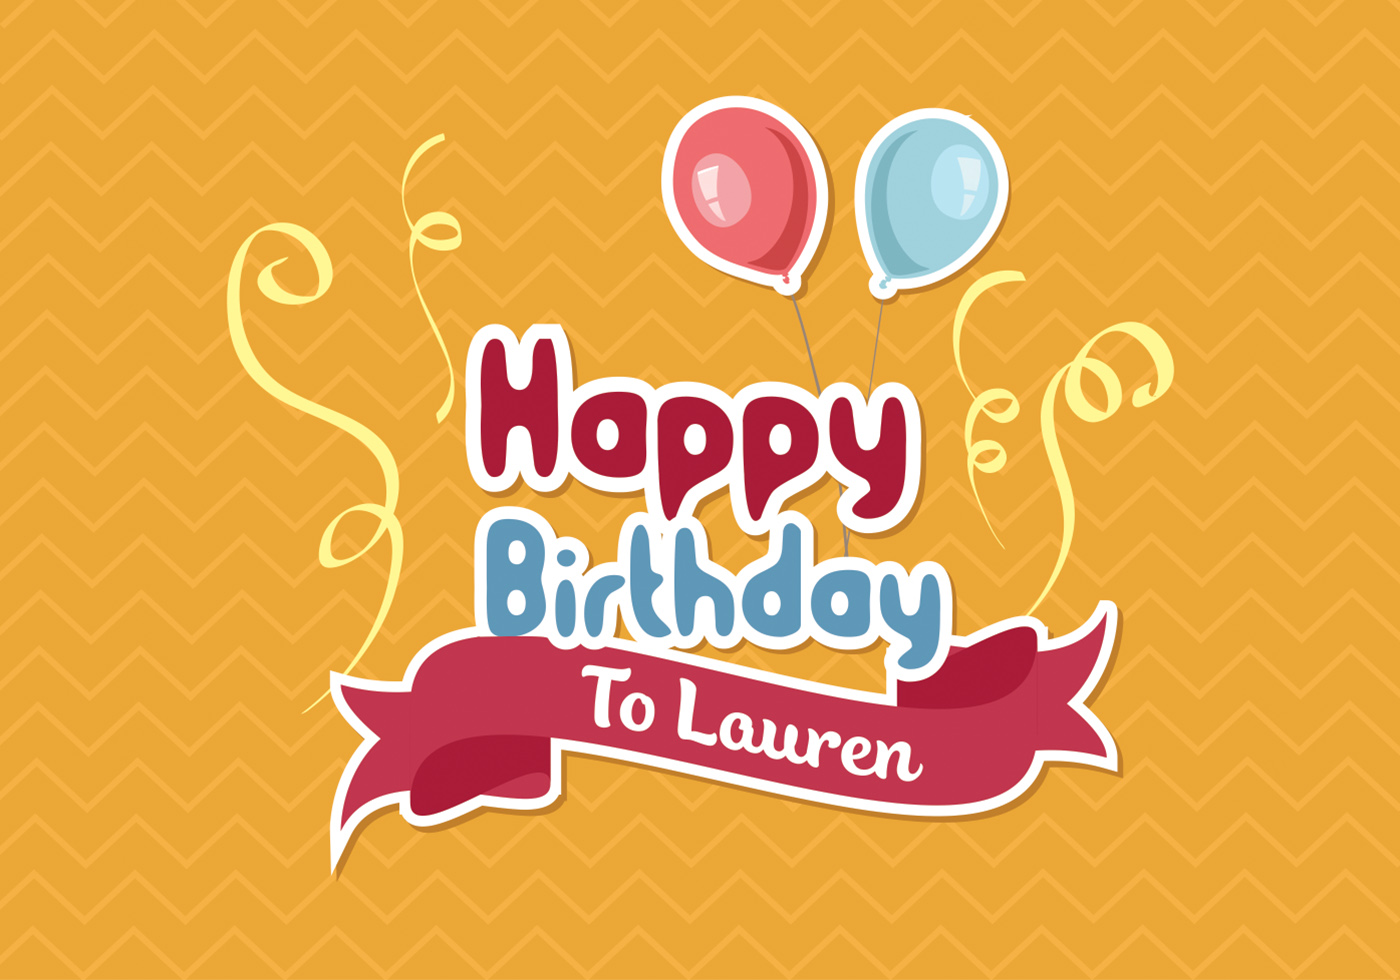 drop Wish u a very happy birthday attractive and flexible. love